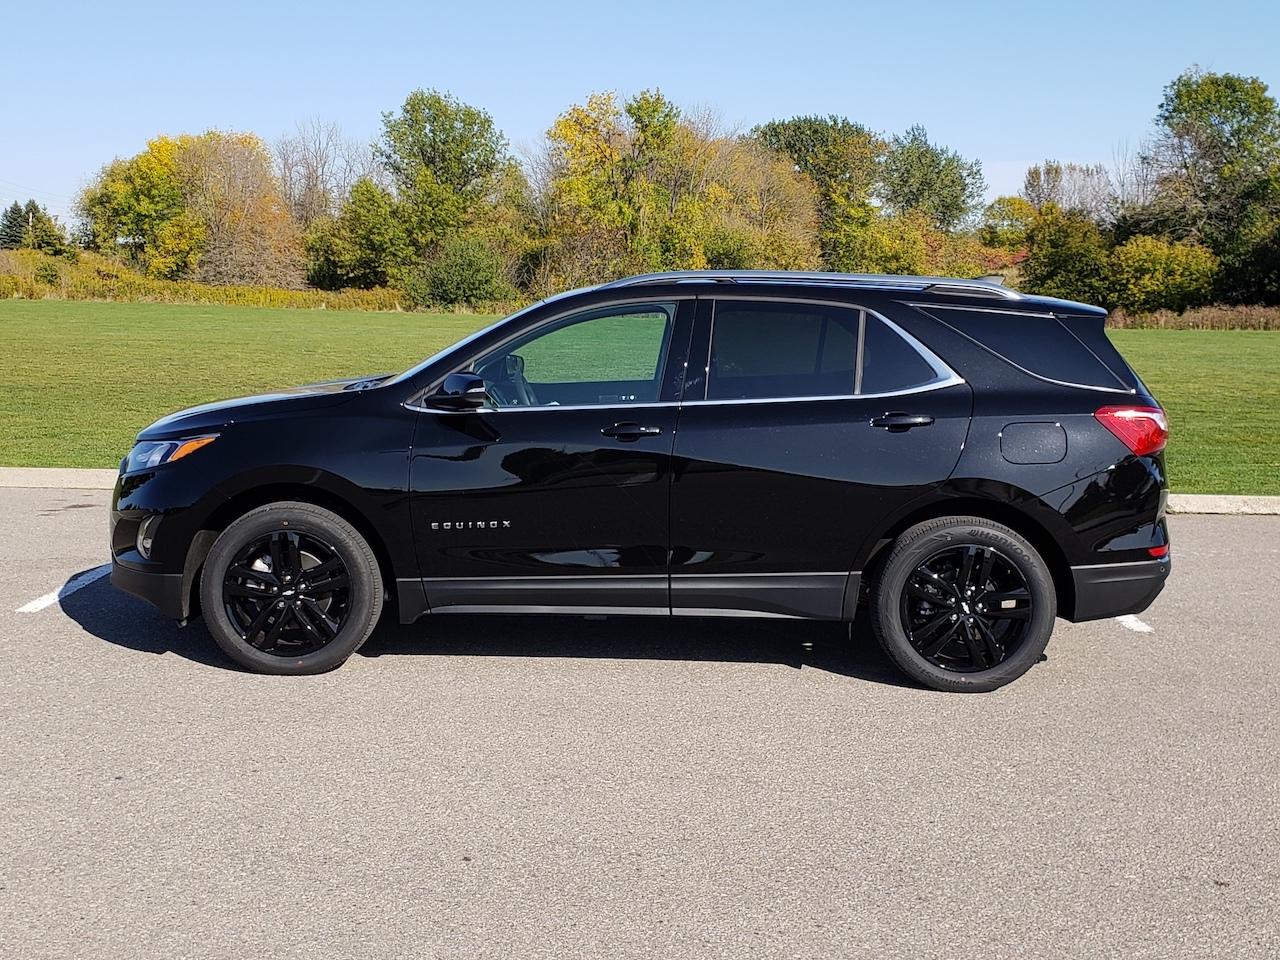 Review 2020 Chevrolet Equinox LT